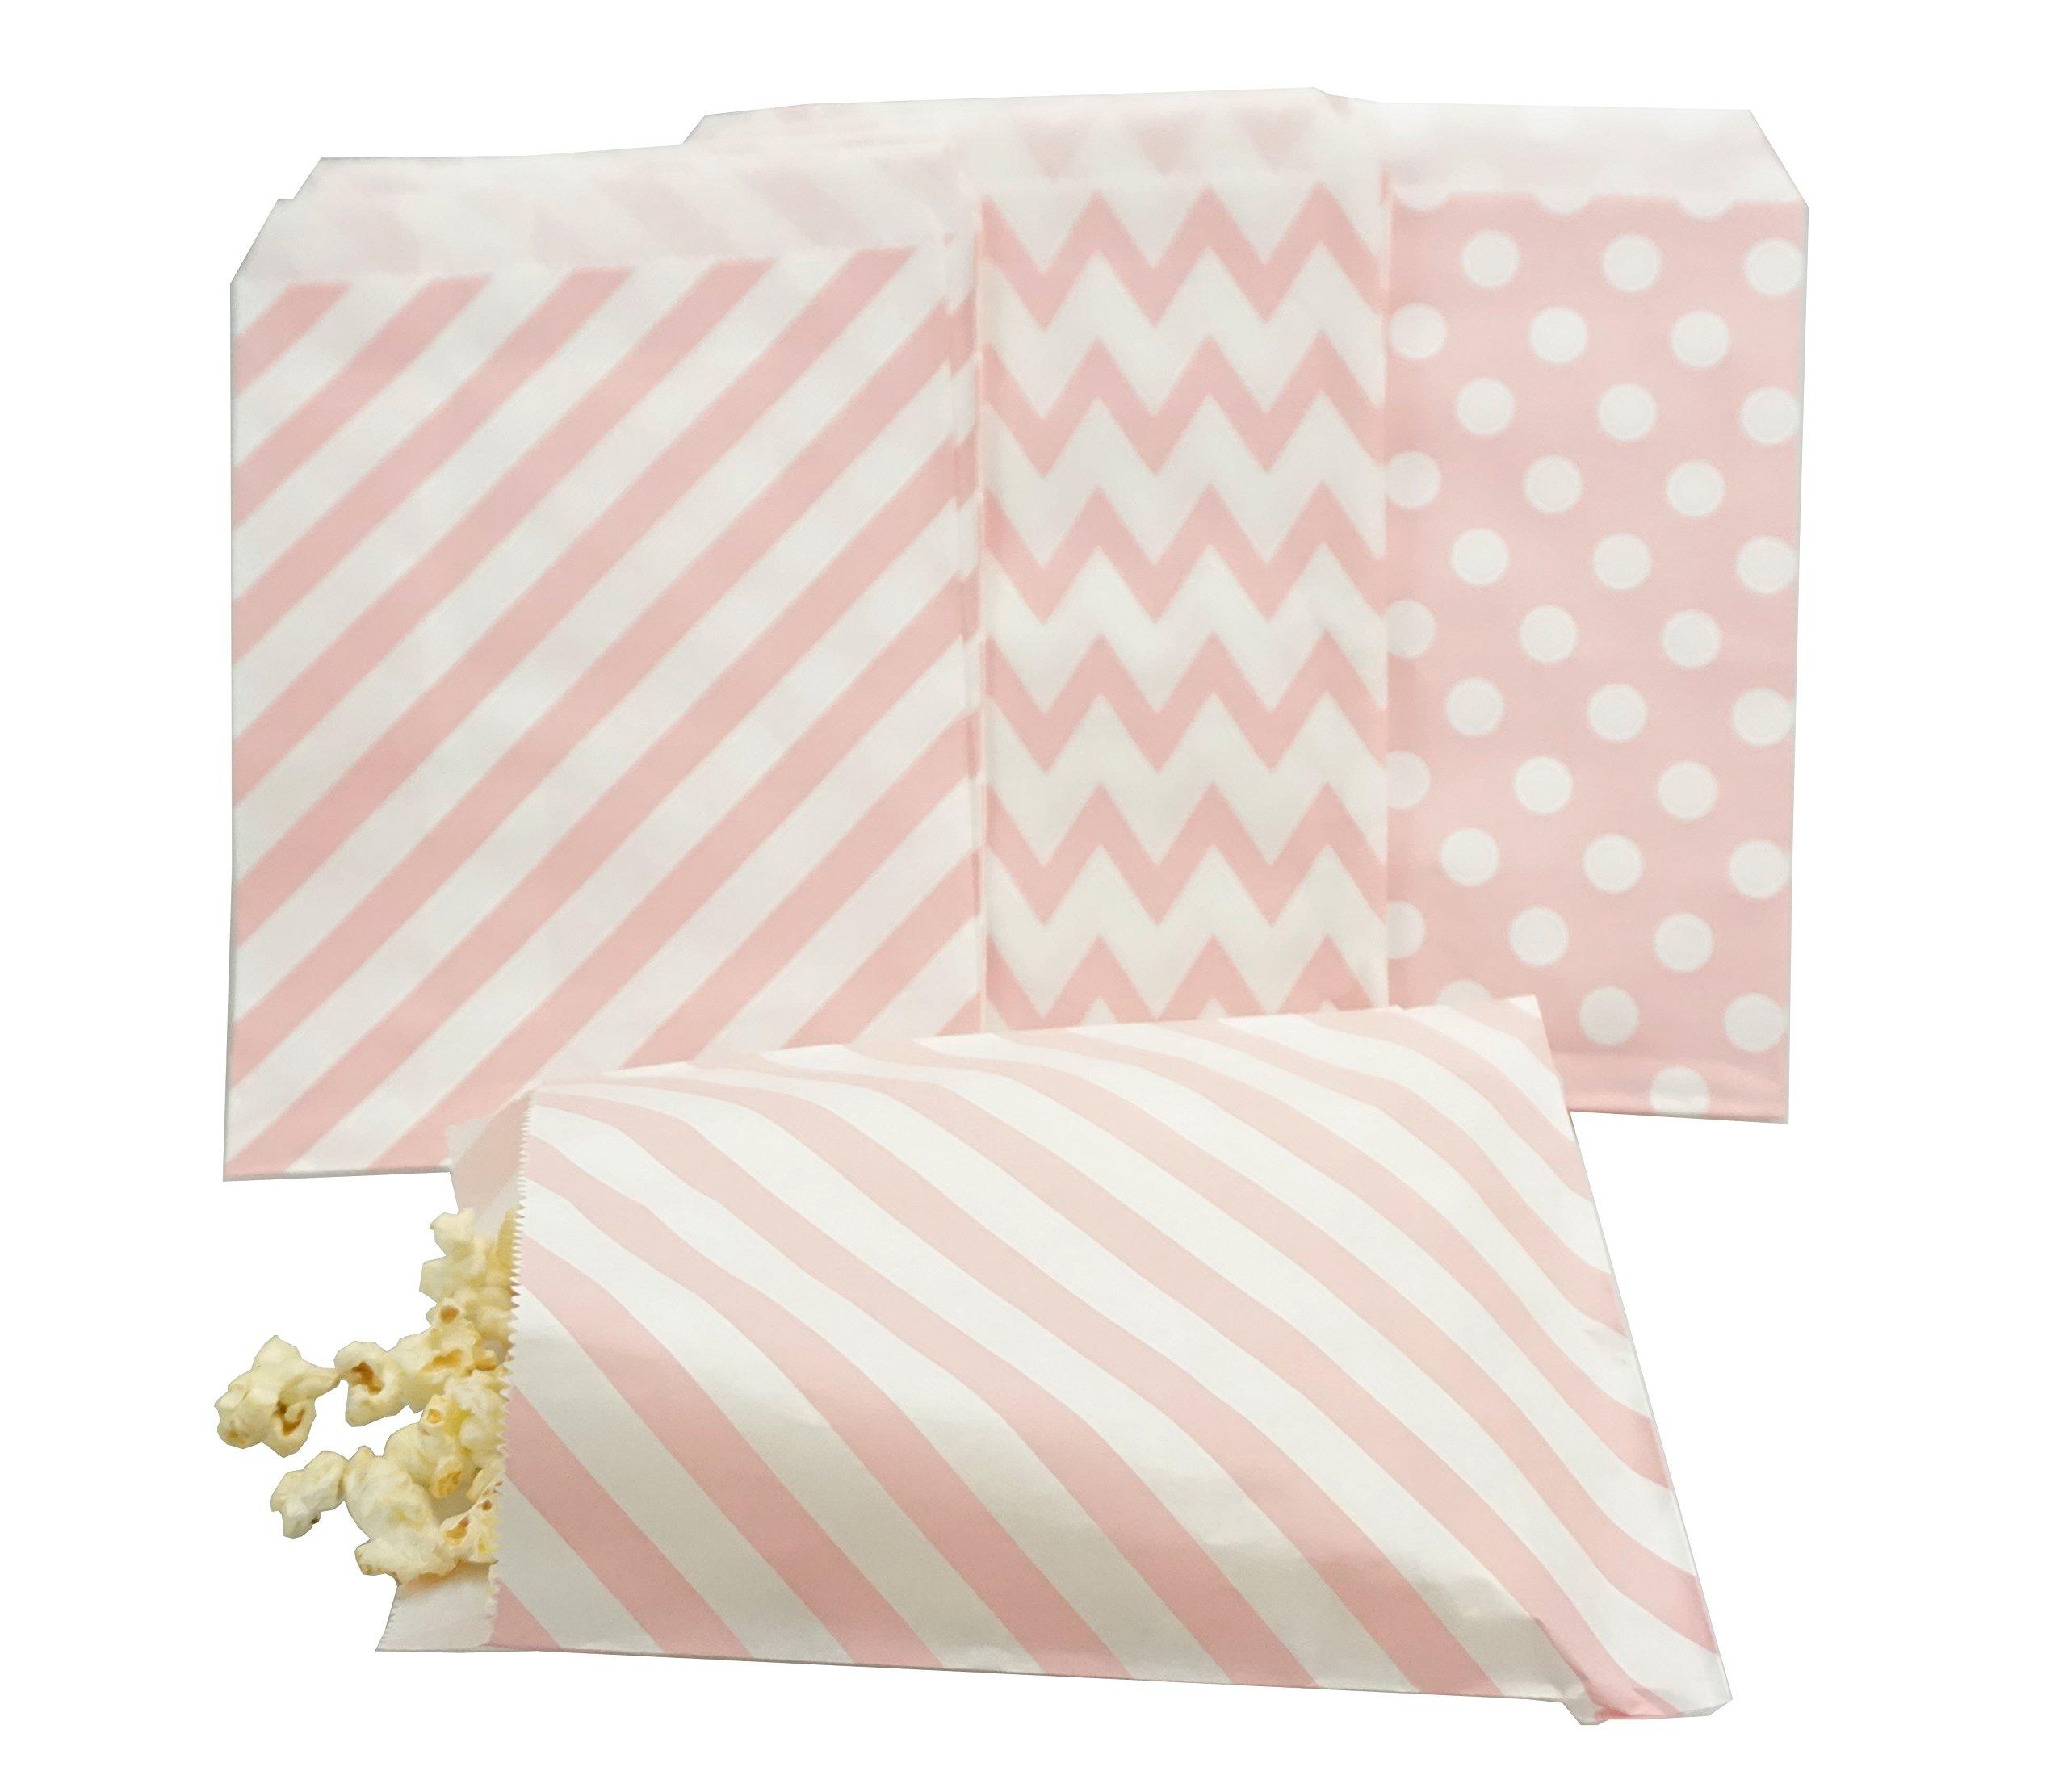 Bilipala Pink Slash Stripe Polka Dot Paper Popcorn Favor Candy Gift Treat Bags, 75 Counts